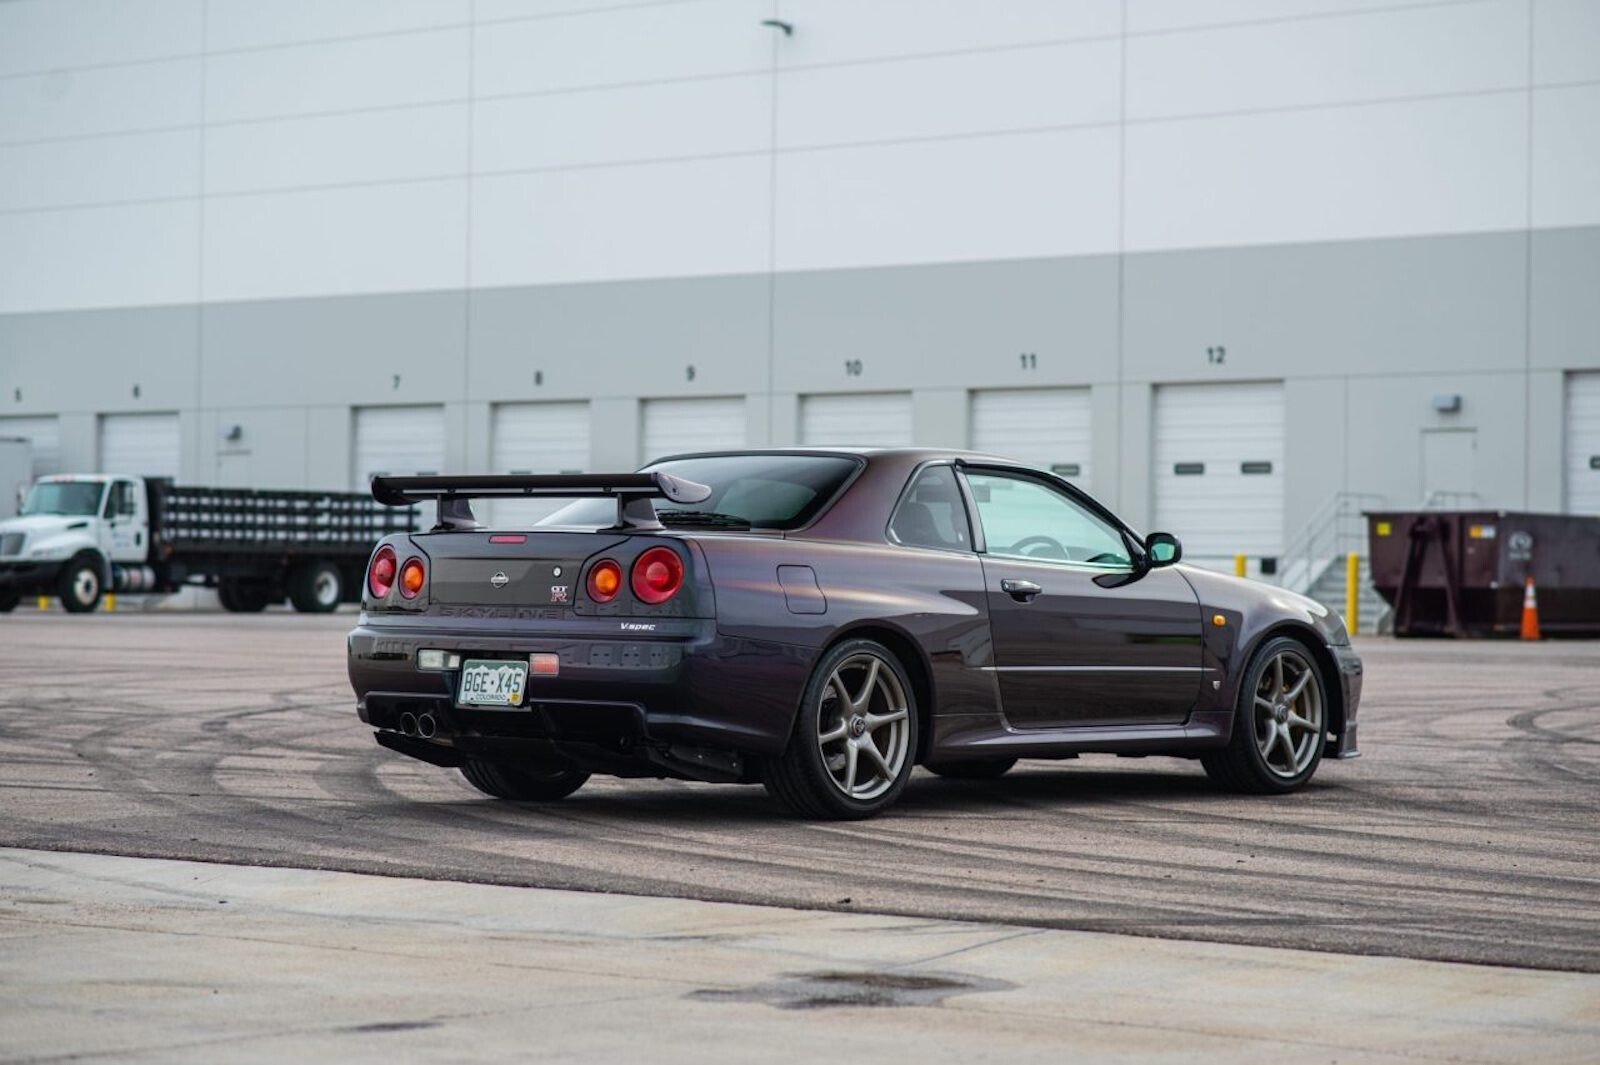 Foto de Nissan Skyline GT-R V-Spec 1999 subasta (2/19)